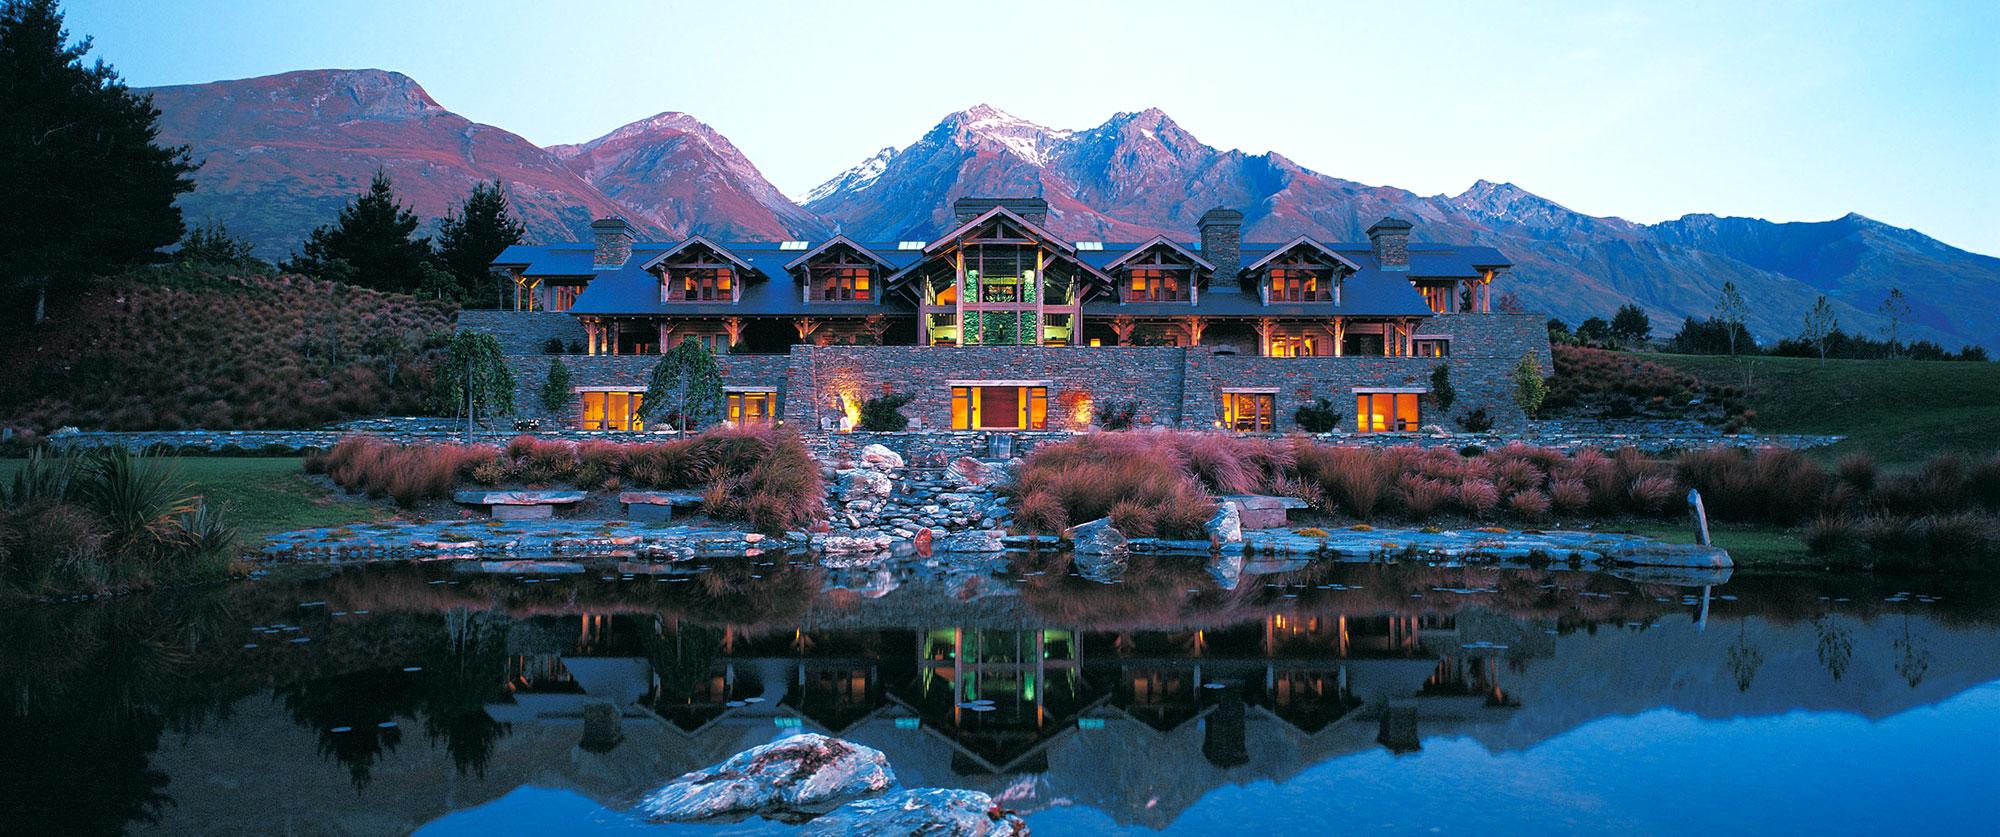 Australia New Zealand - Honeymoon - Vacation - Package - bucket list - 5 star - Australia New Zealand Honeymoon Package